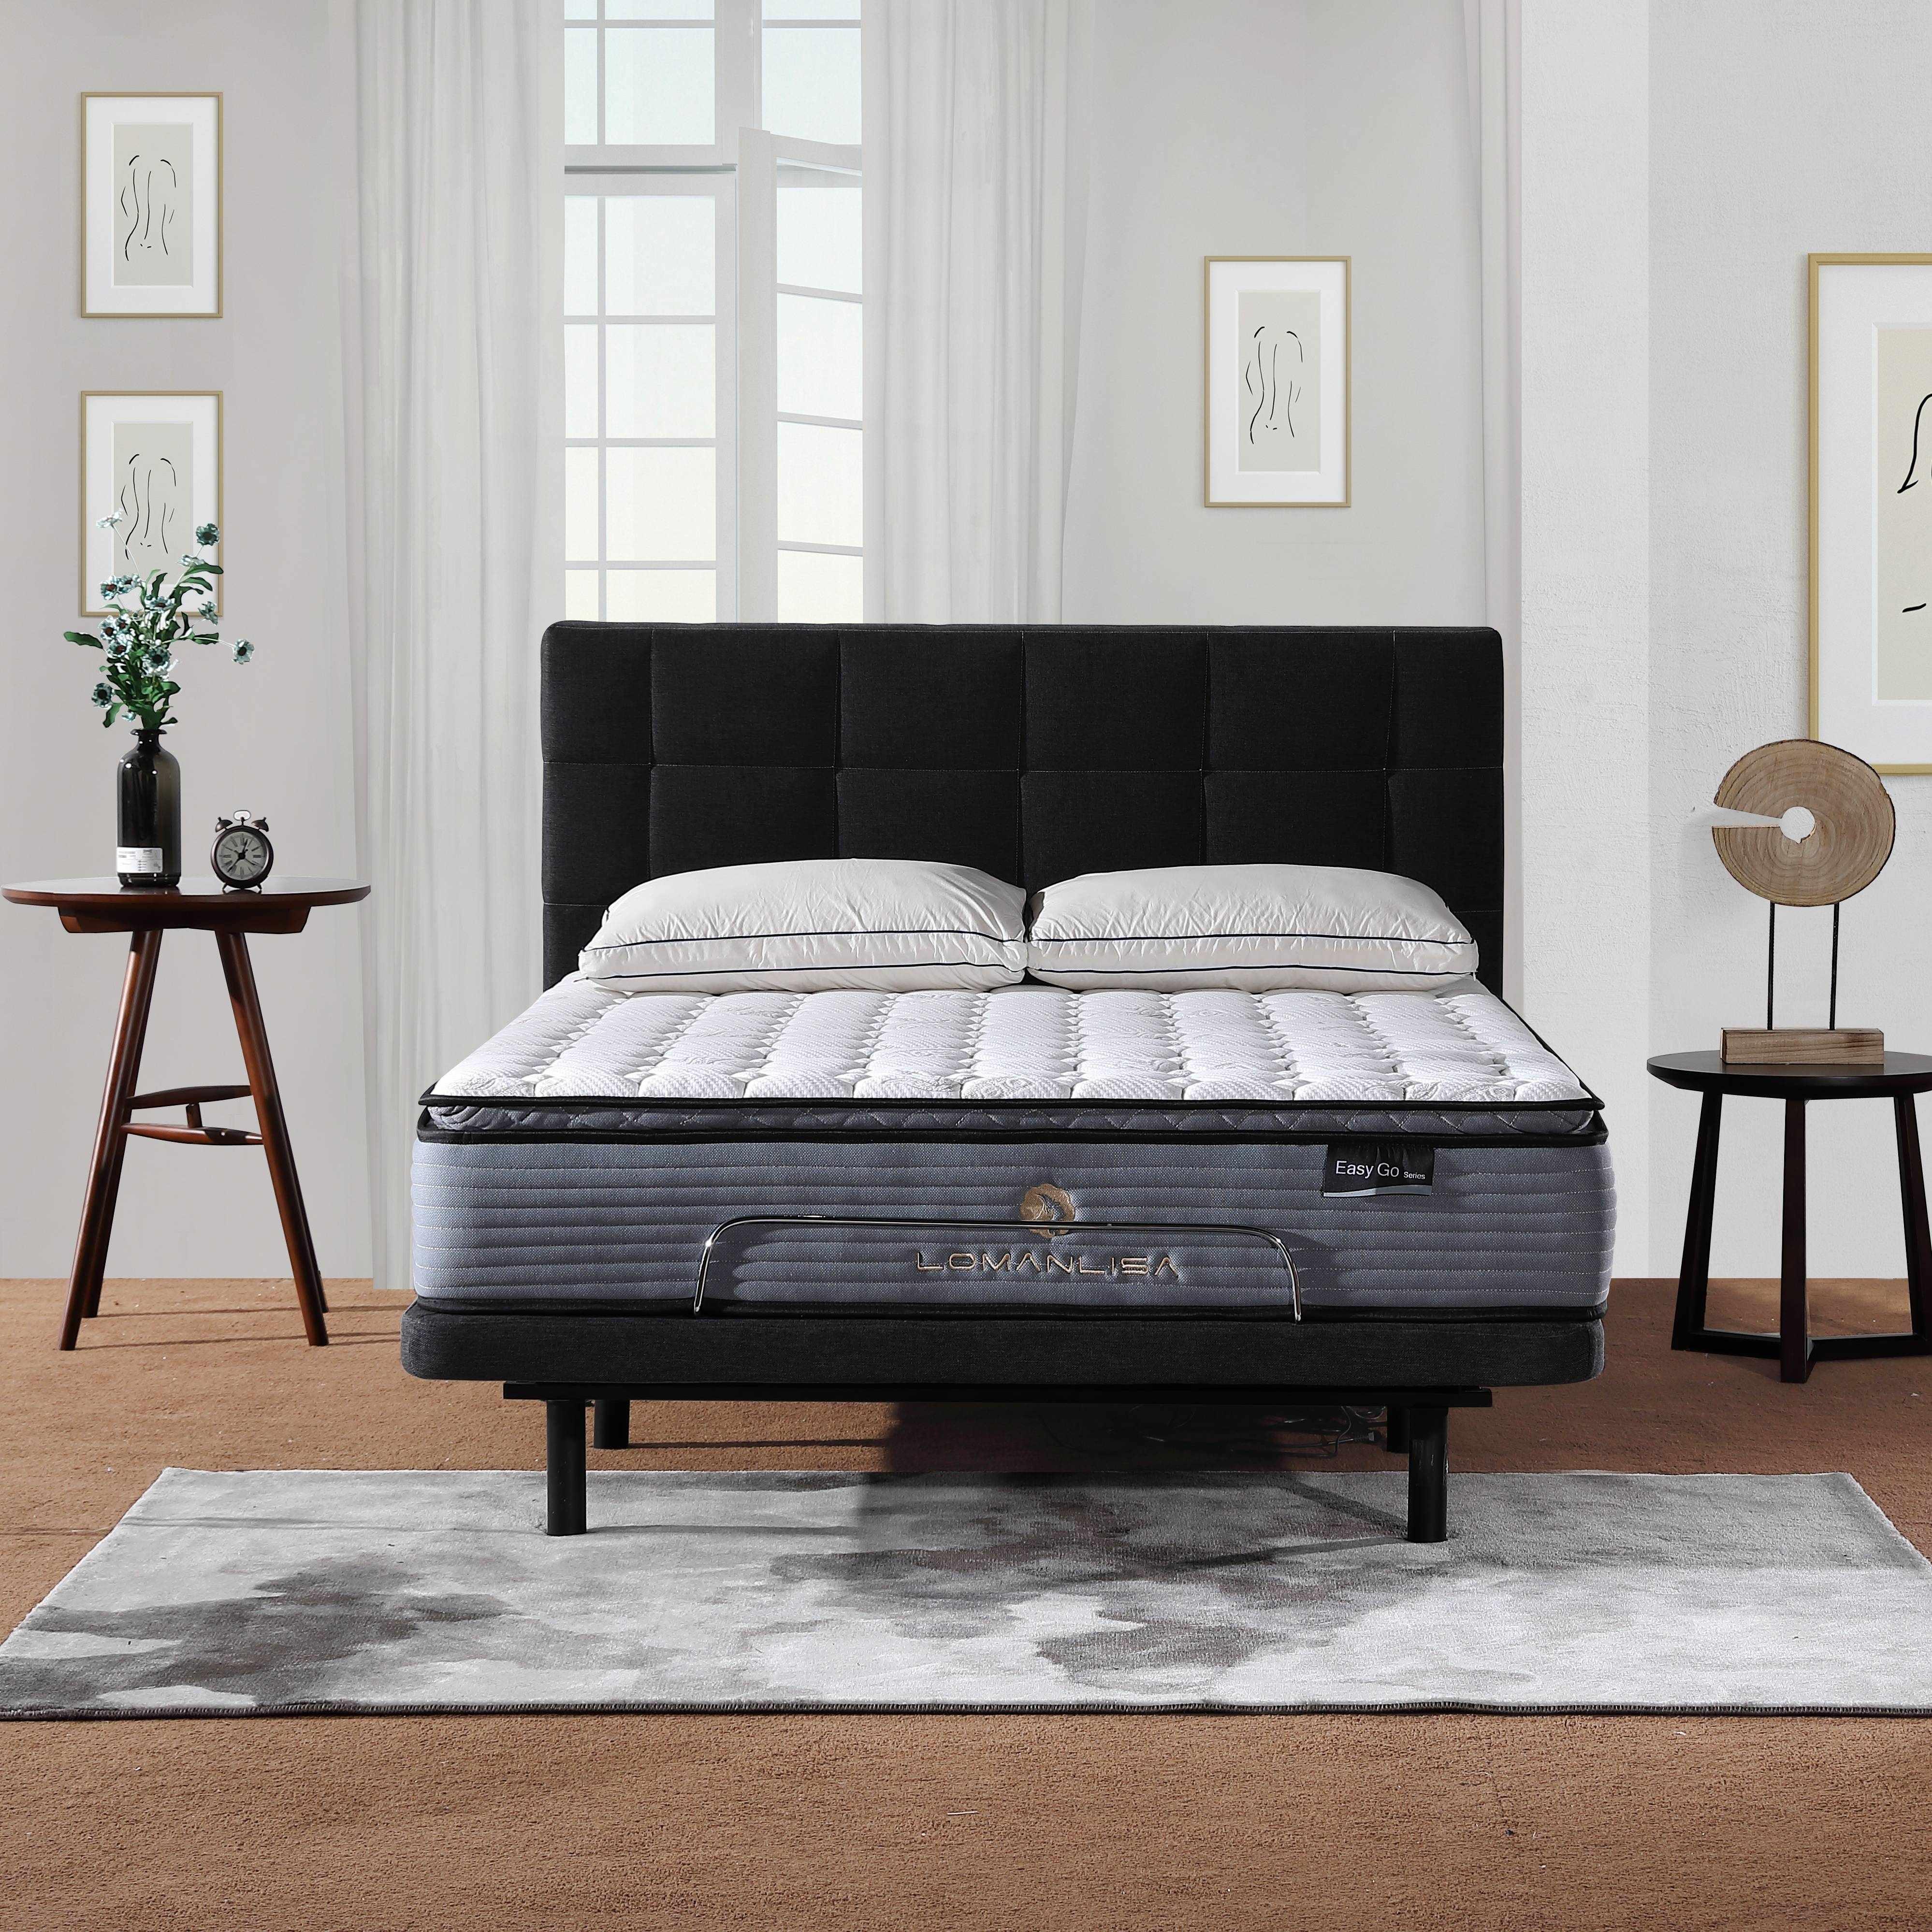 JLH packed three quarter mattress for sale for tavern-1